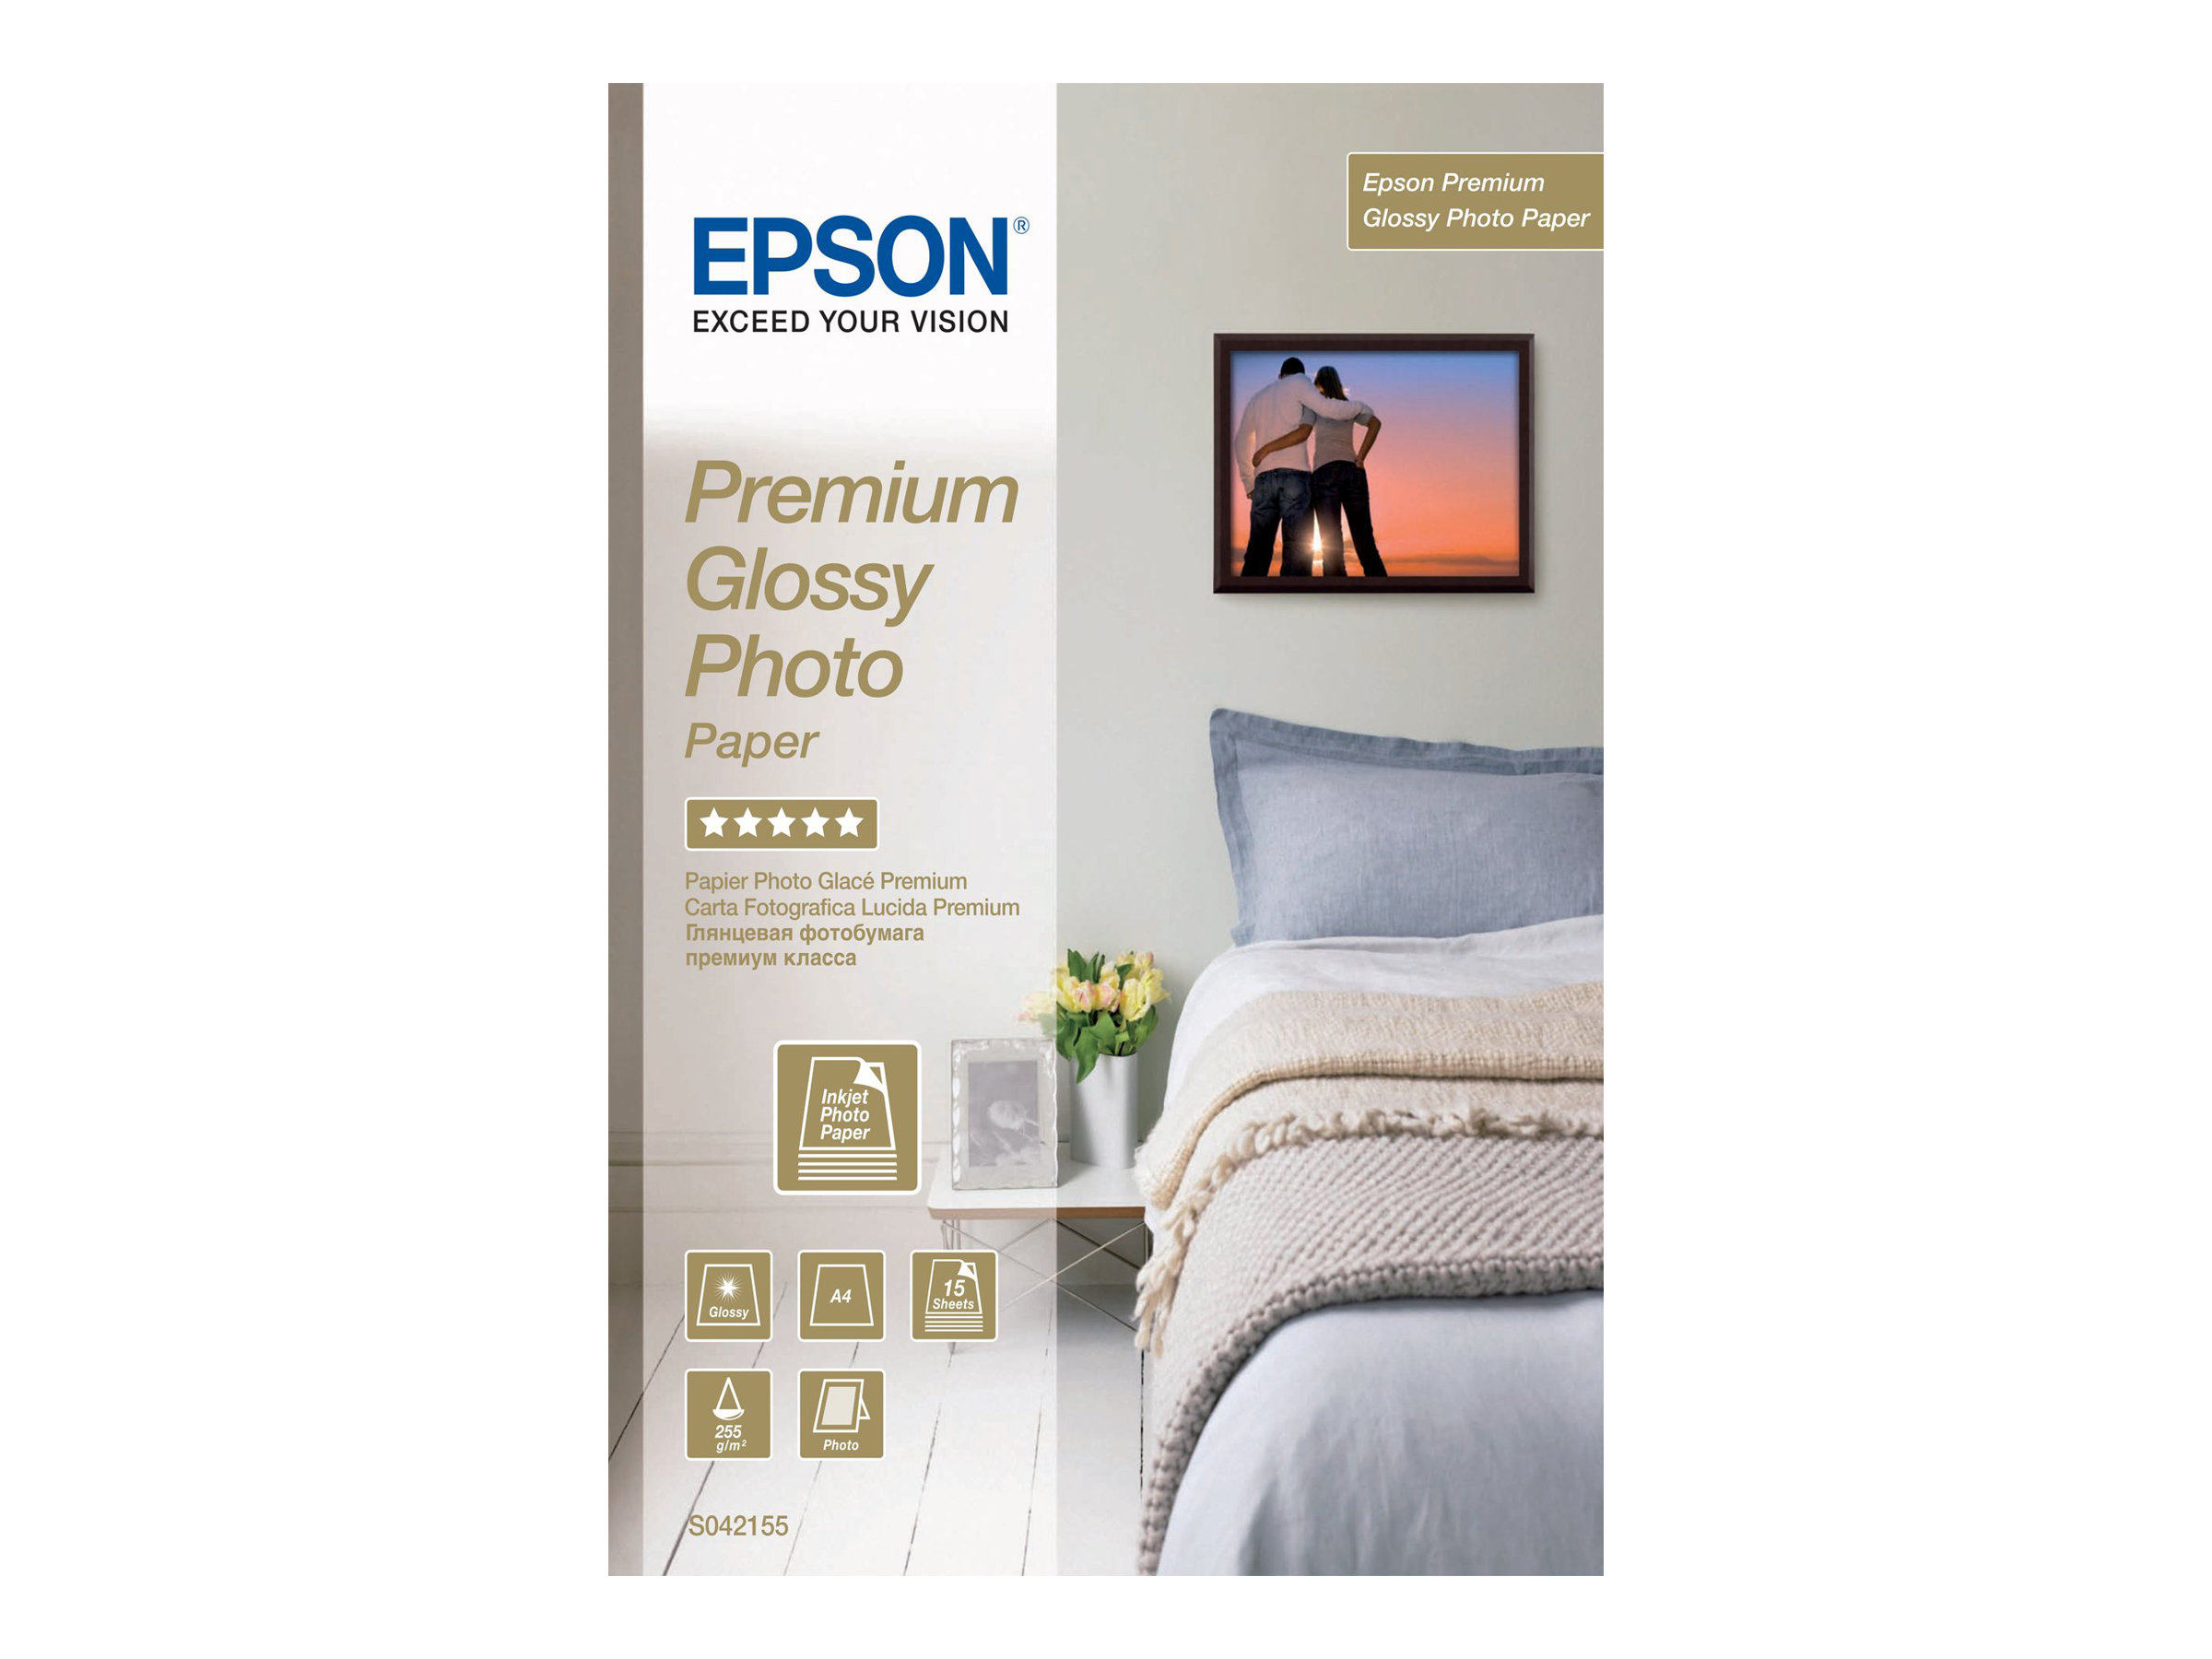 Epson Premium Glossy Photo Paper - Glänzend - A4 (210 x 297 mm)